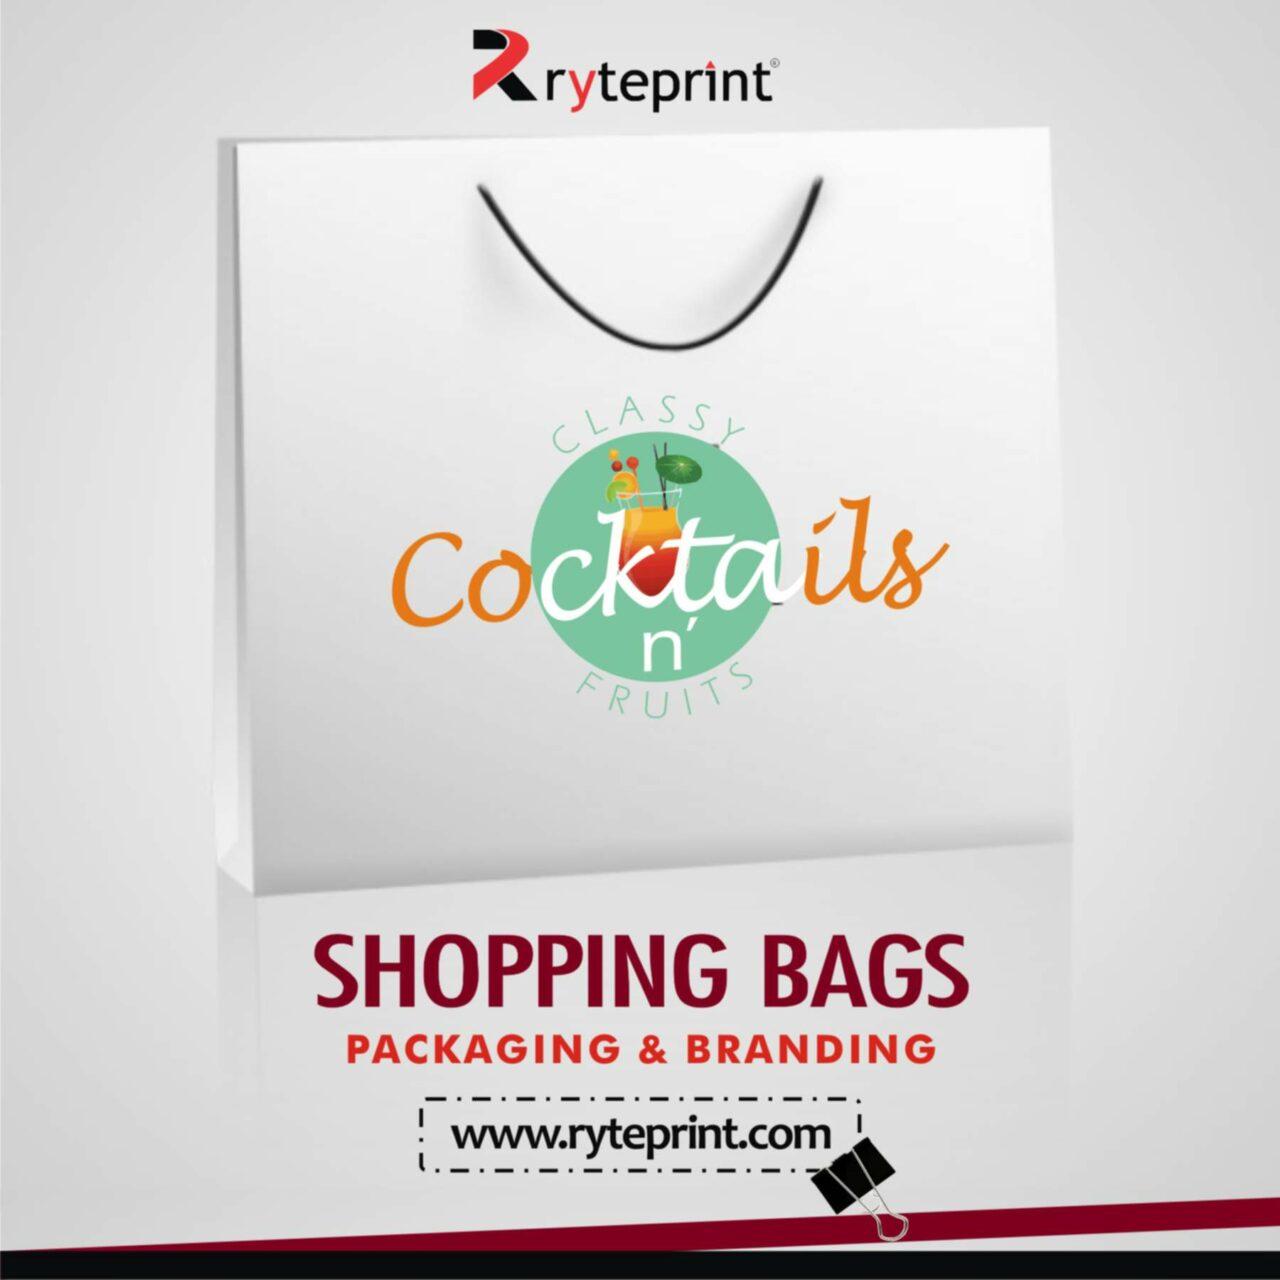 Ryteprint Paper Bags Ad